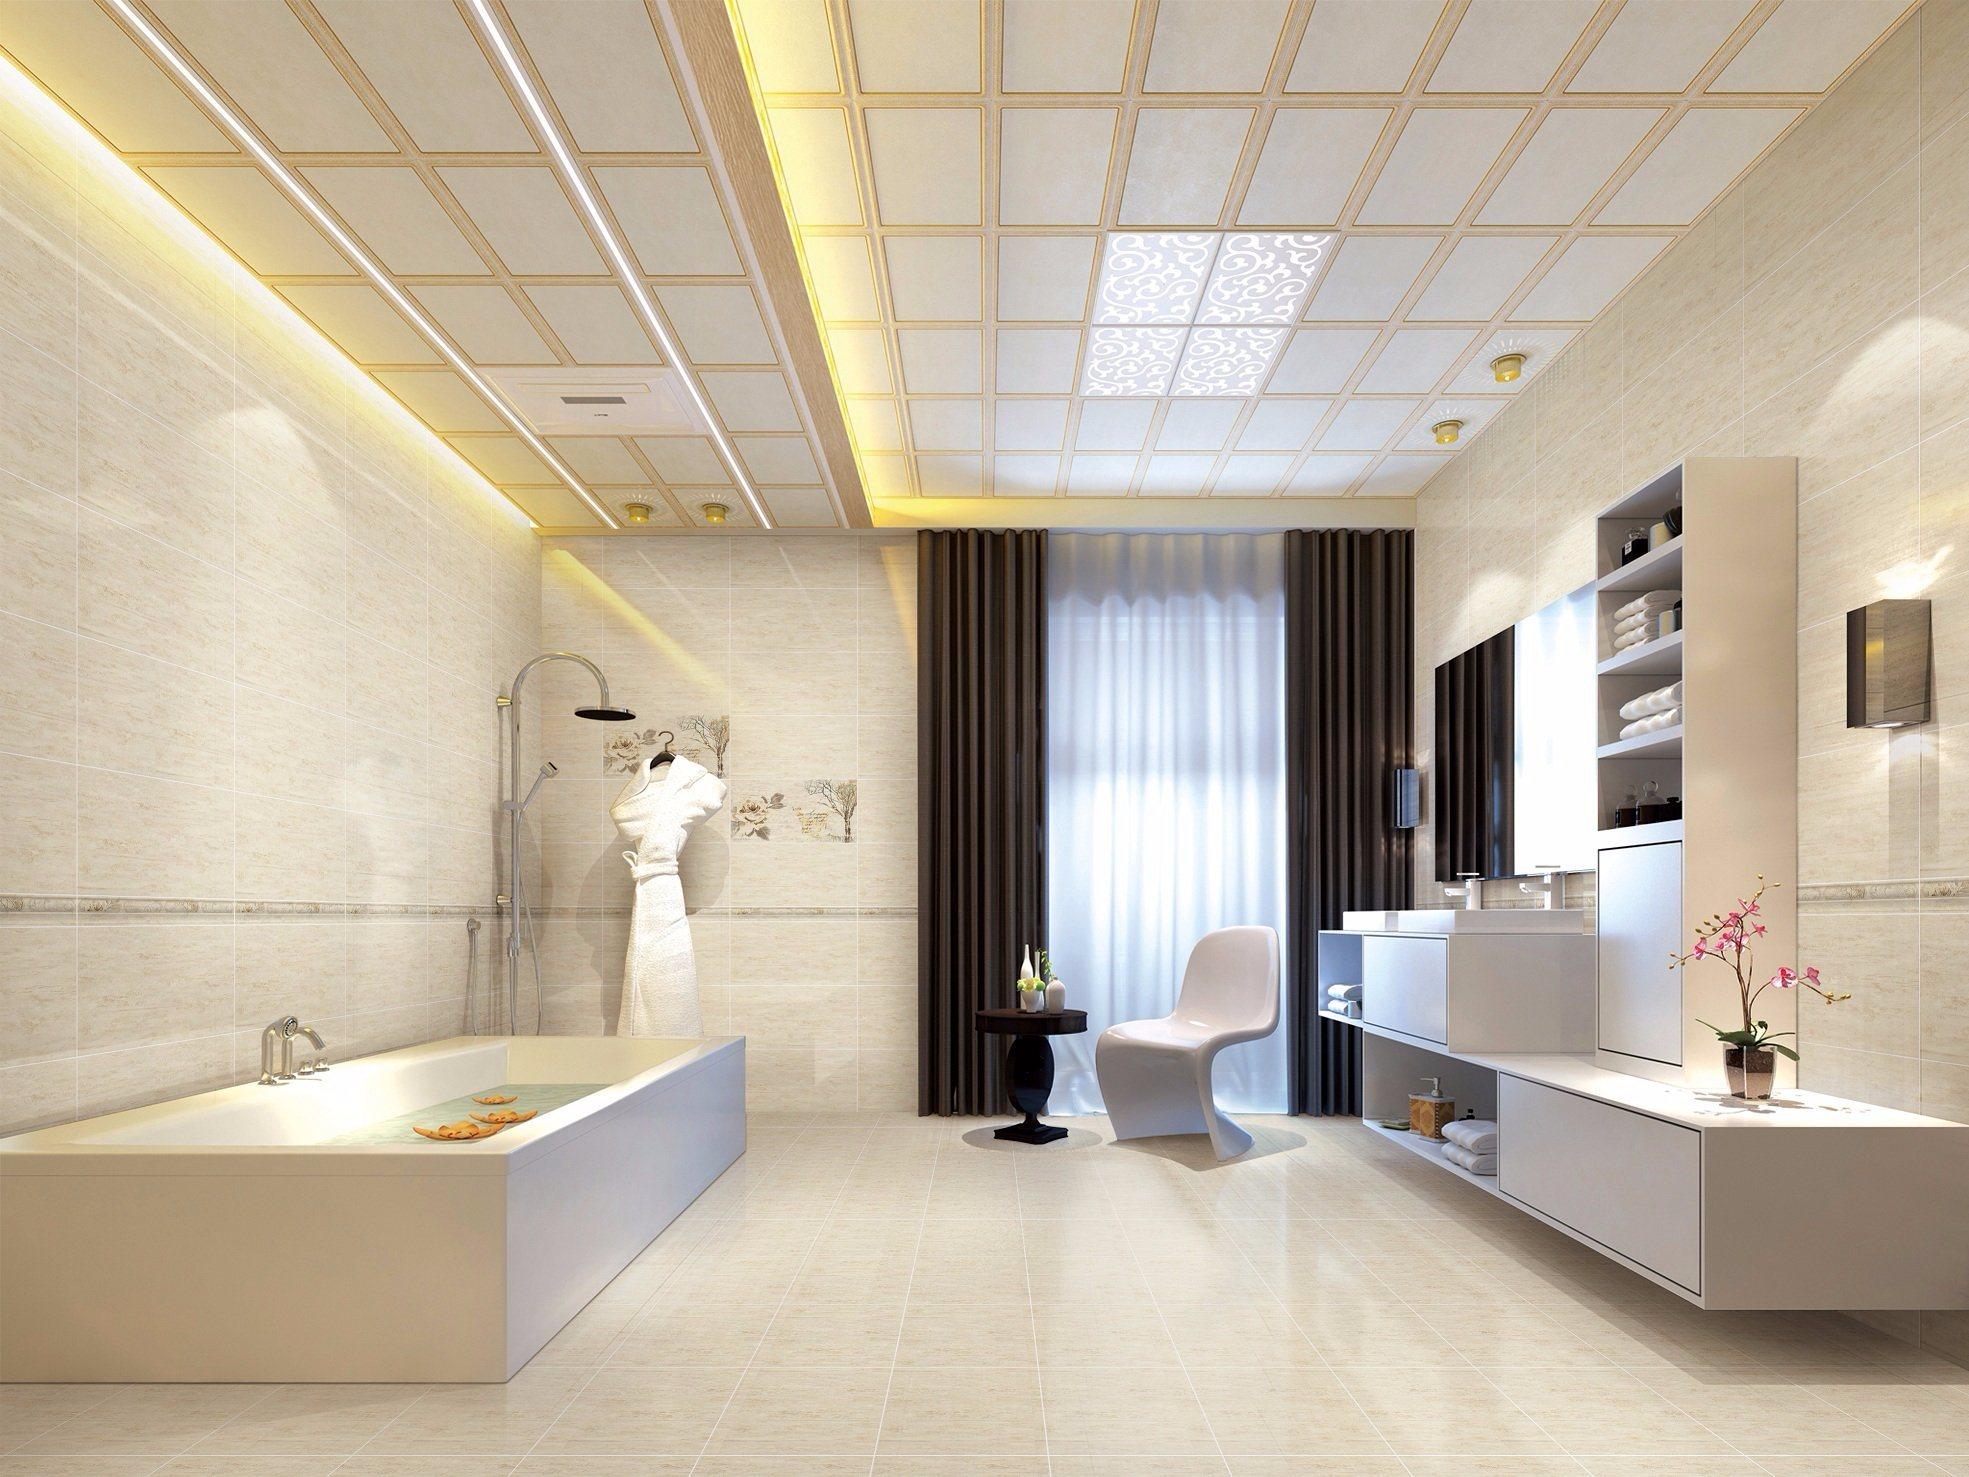 Bathroom Ceramic Wall And Floor Tile